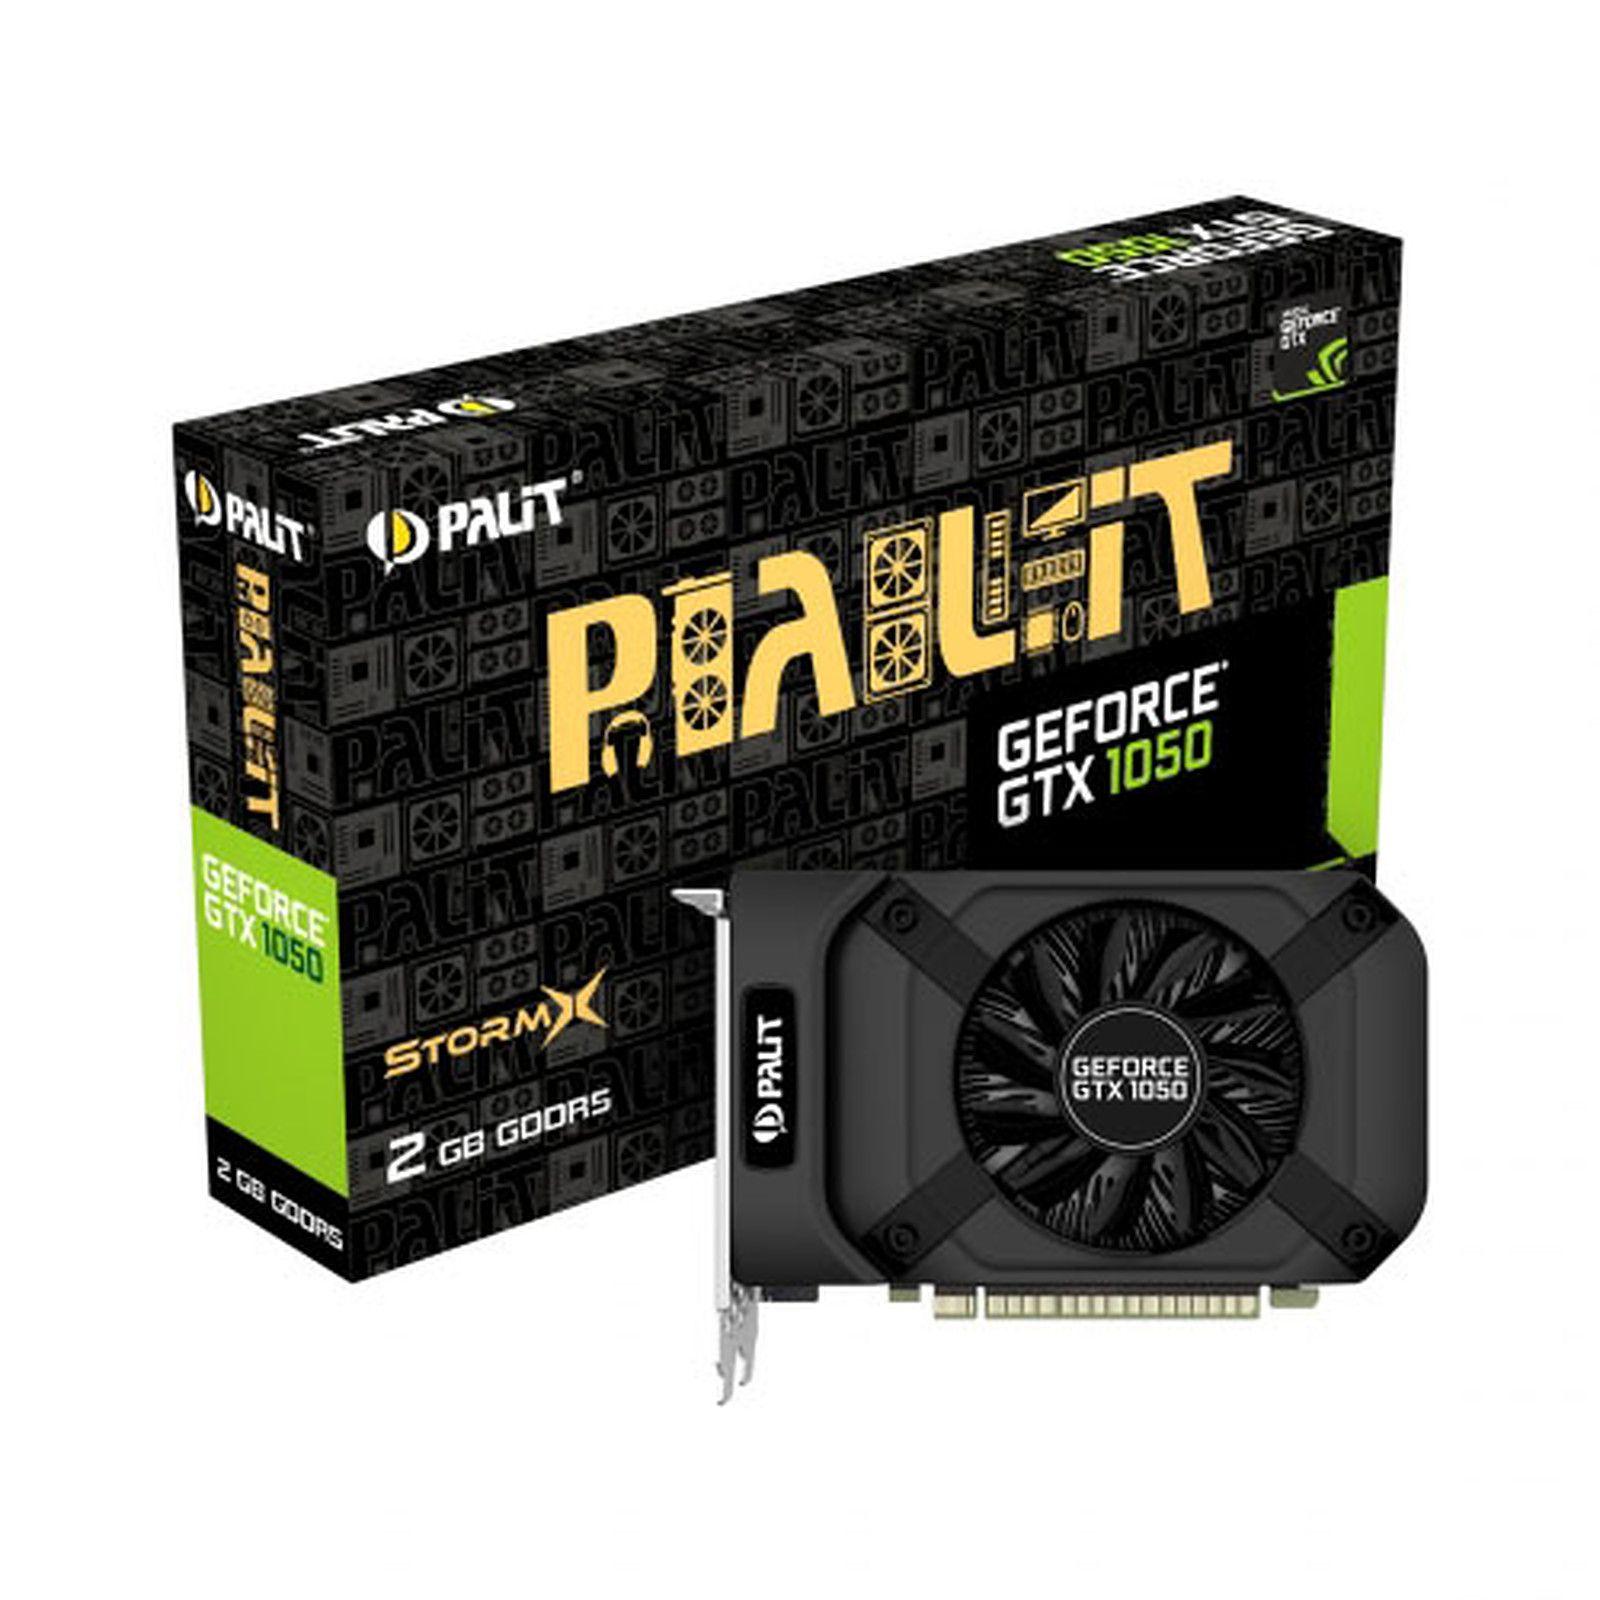 Videokaart GTX 1050 StormX Palit Nvidia @ SHS Computer